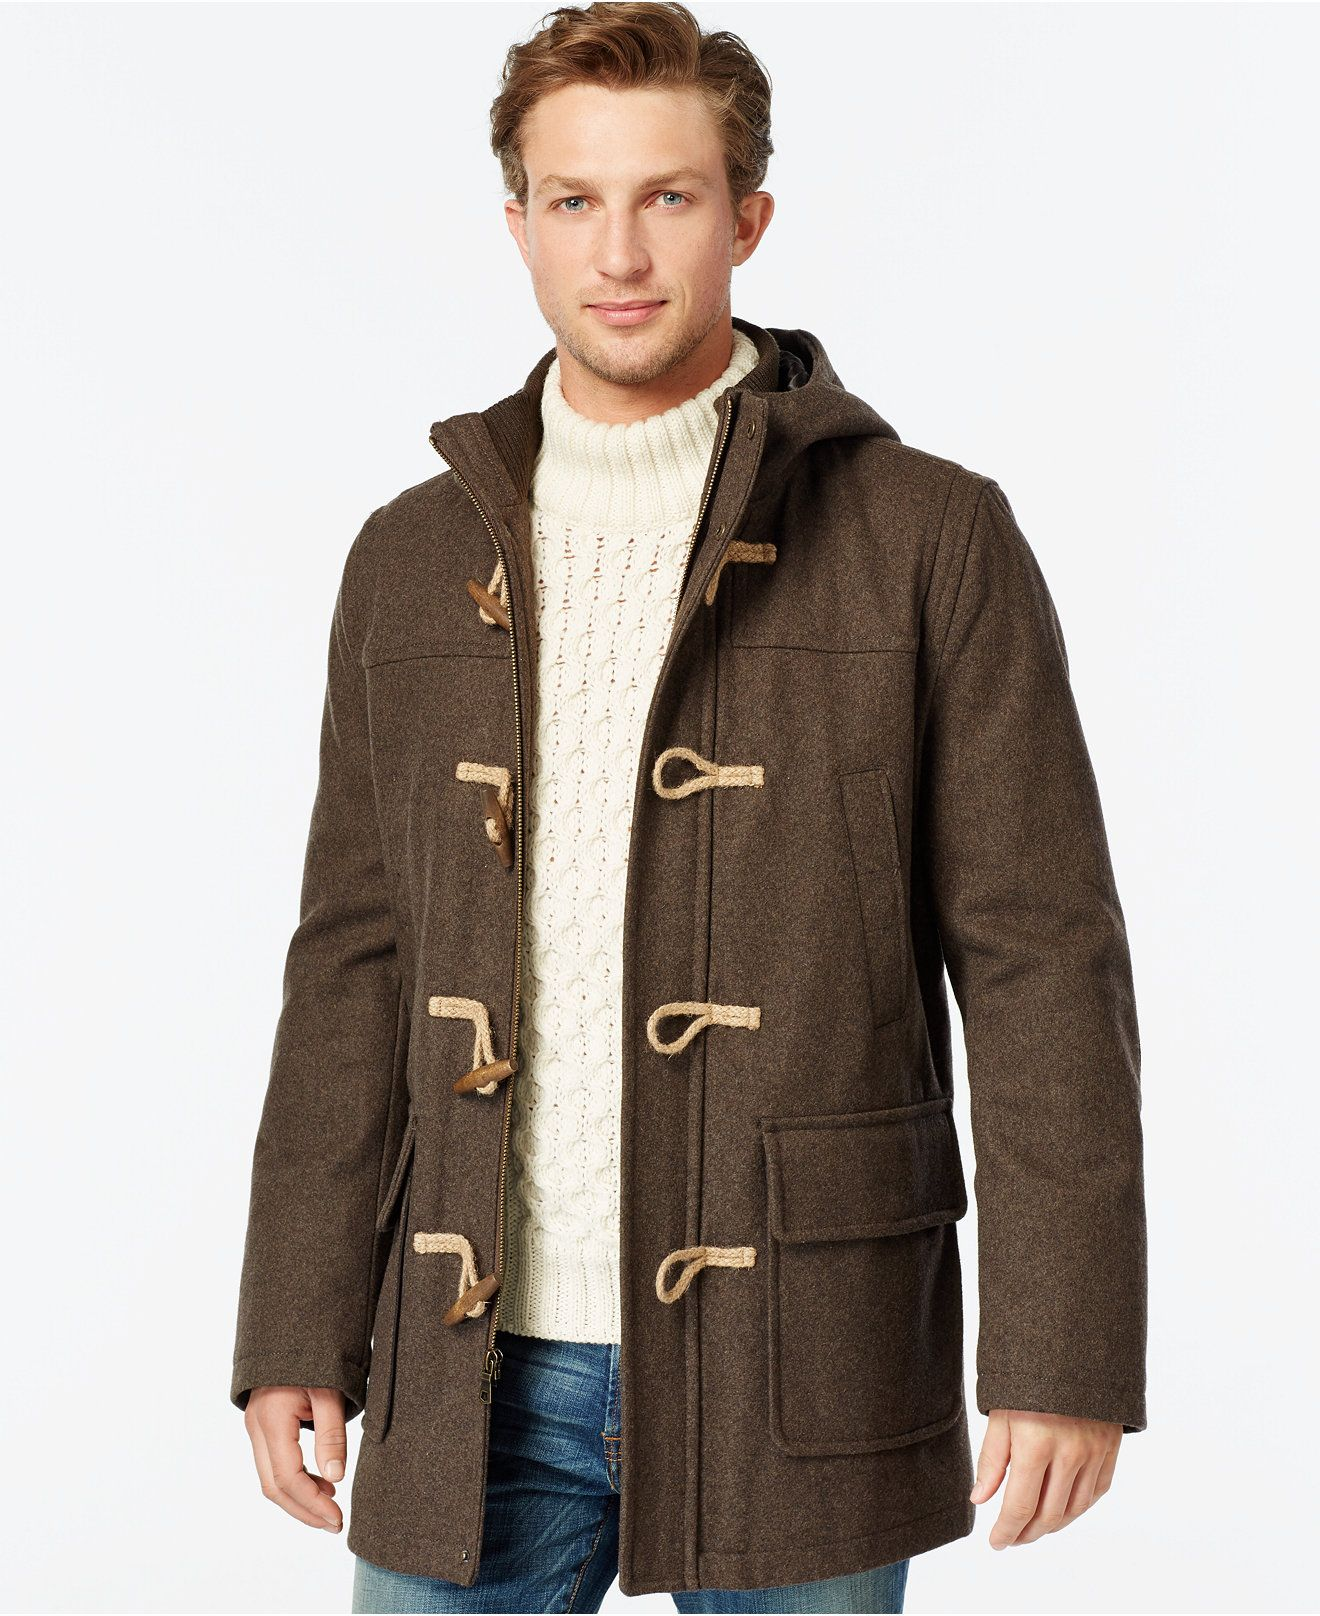 Tommy Hilfiger Wool Blend Melton Toggle Coat Coats Jackets Men Macy S Coat Mens Winter Fashion Toggle Coat [ 1616 x 1320 Pixel ]